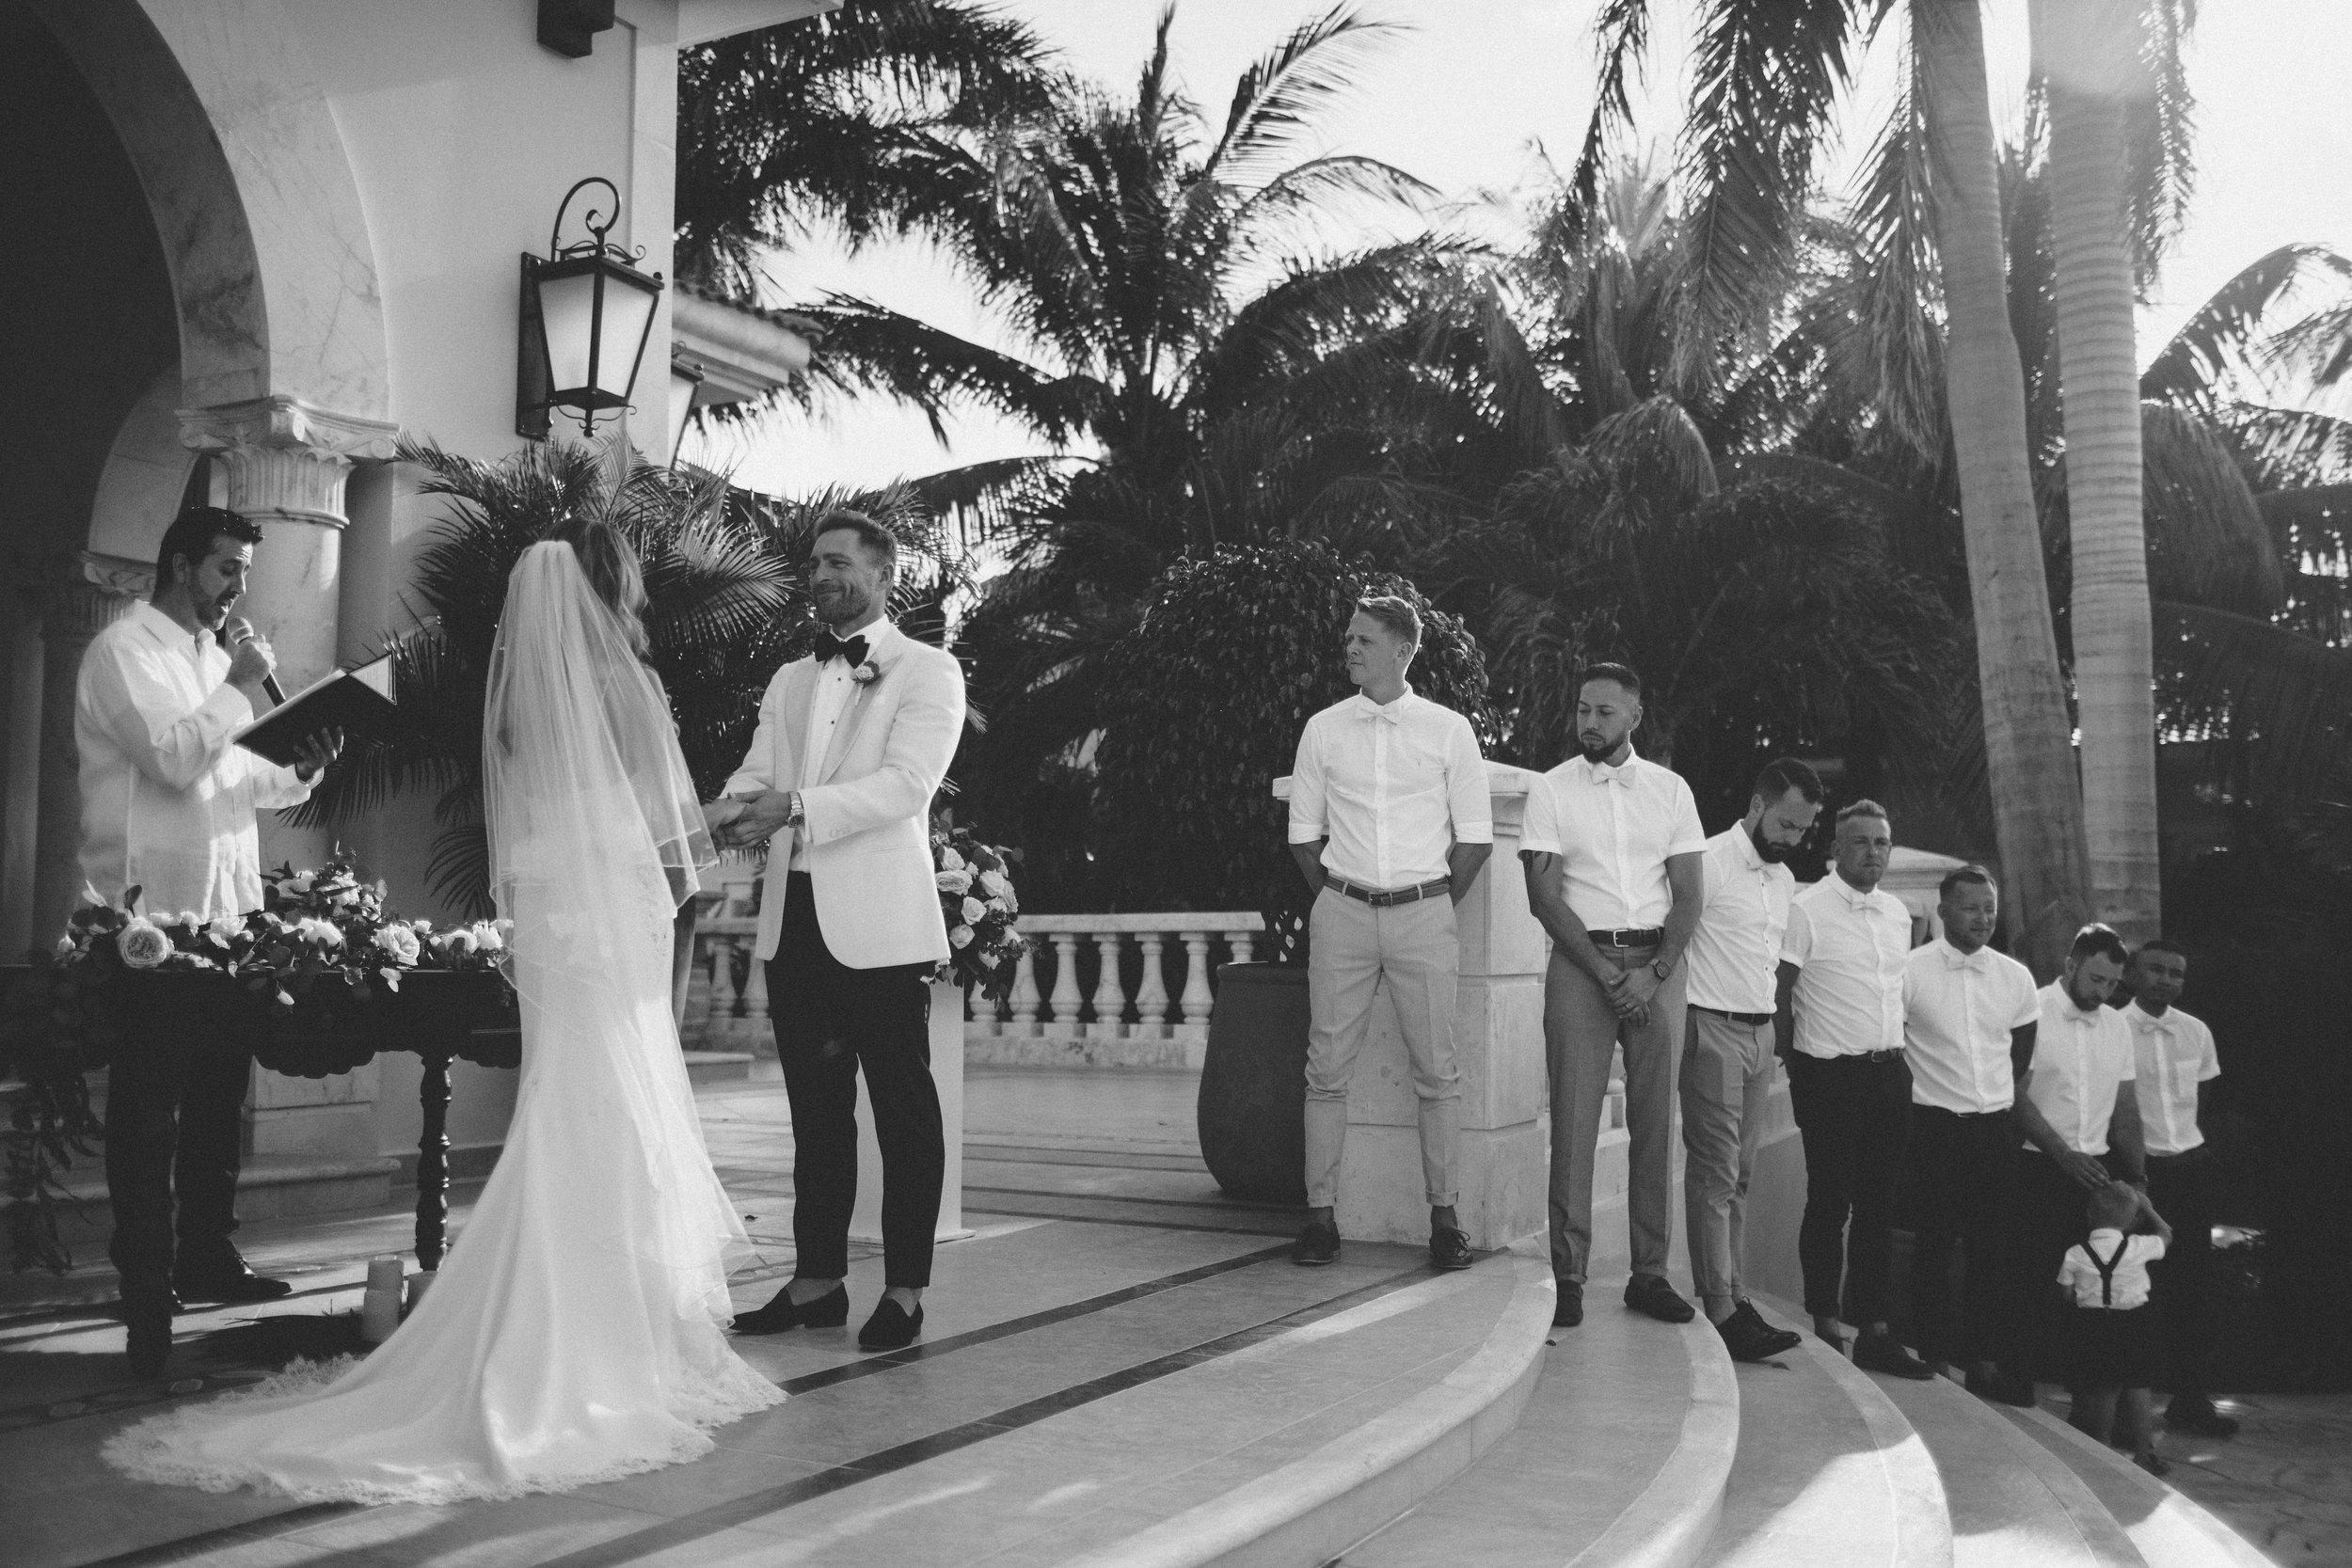 mexico_wedding_cancun_villa_la_joya_evangeline_lane_058.jpg